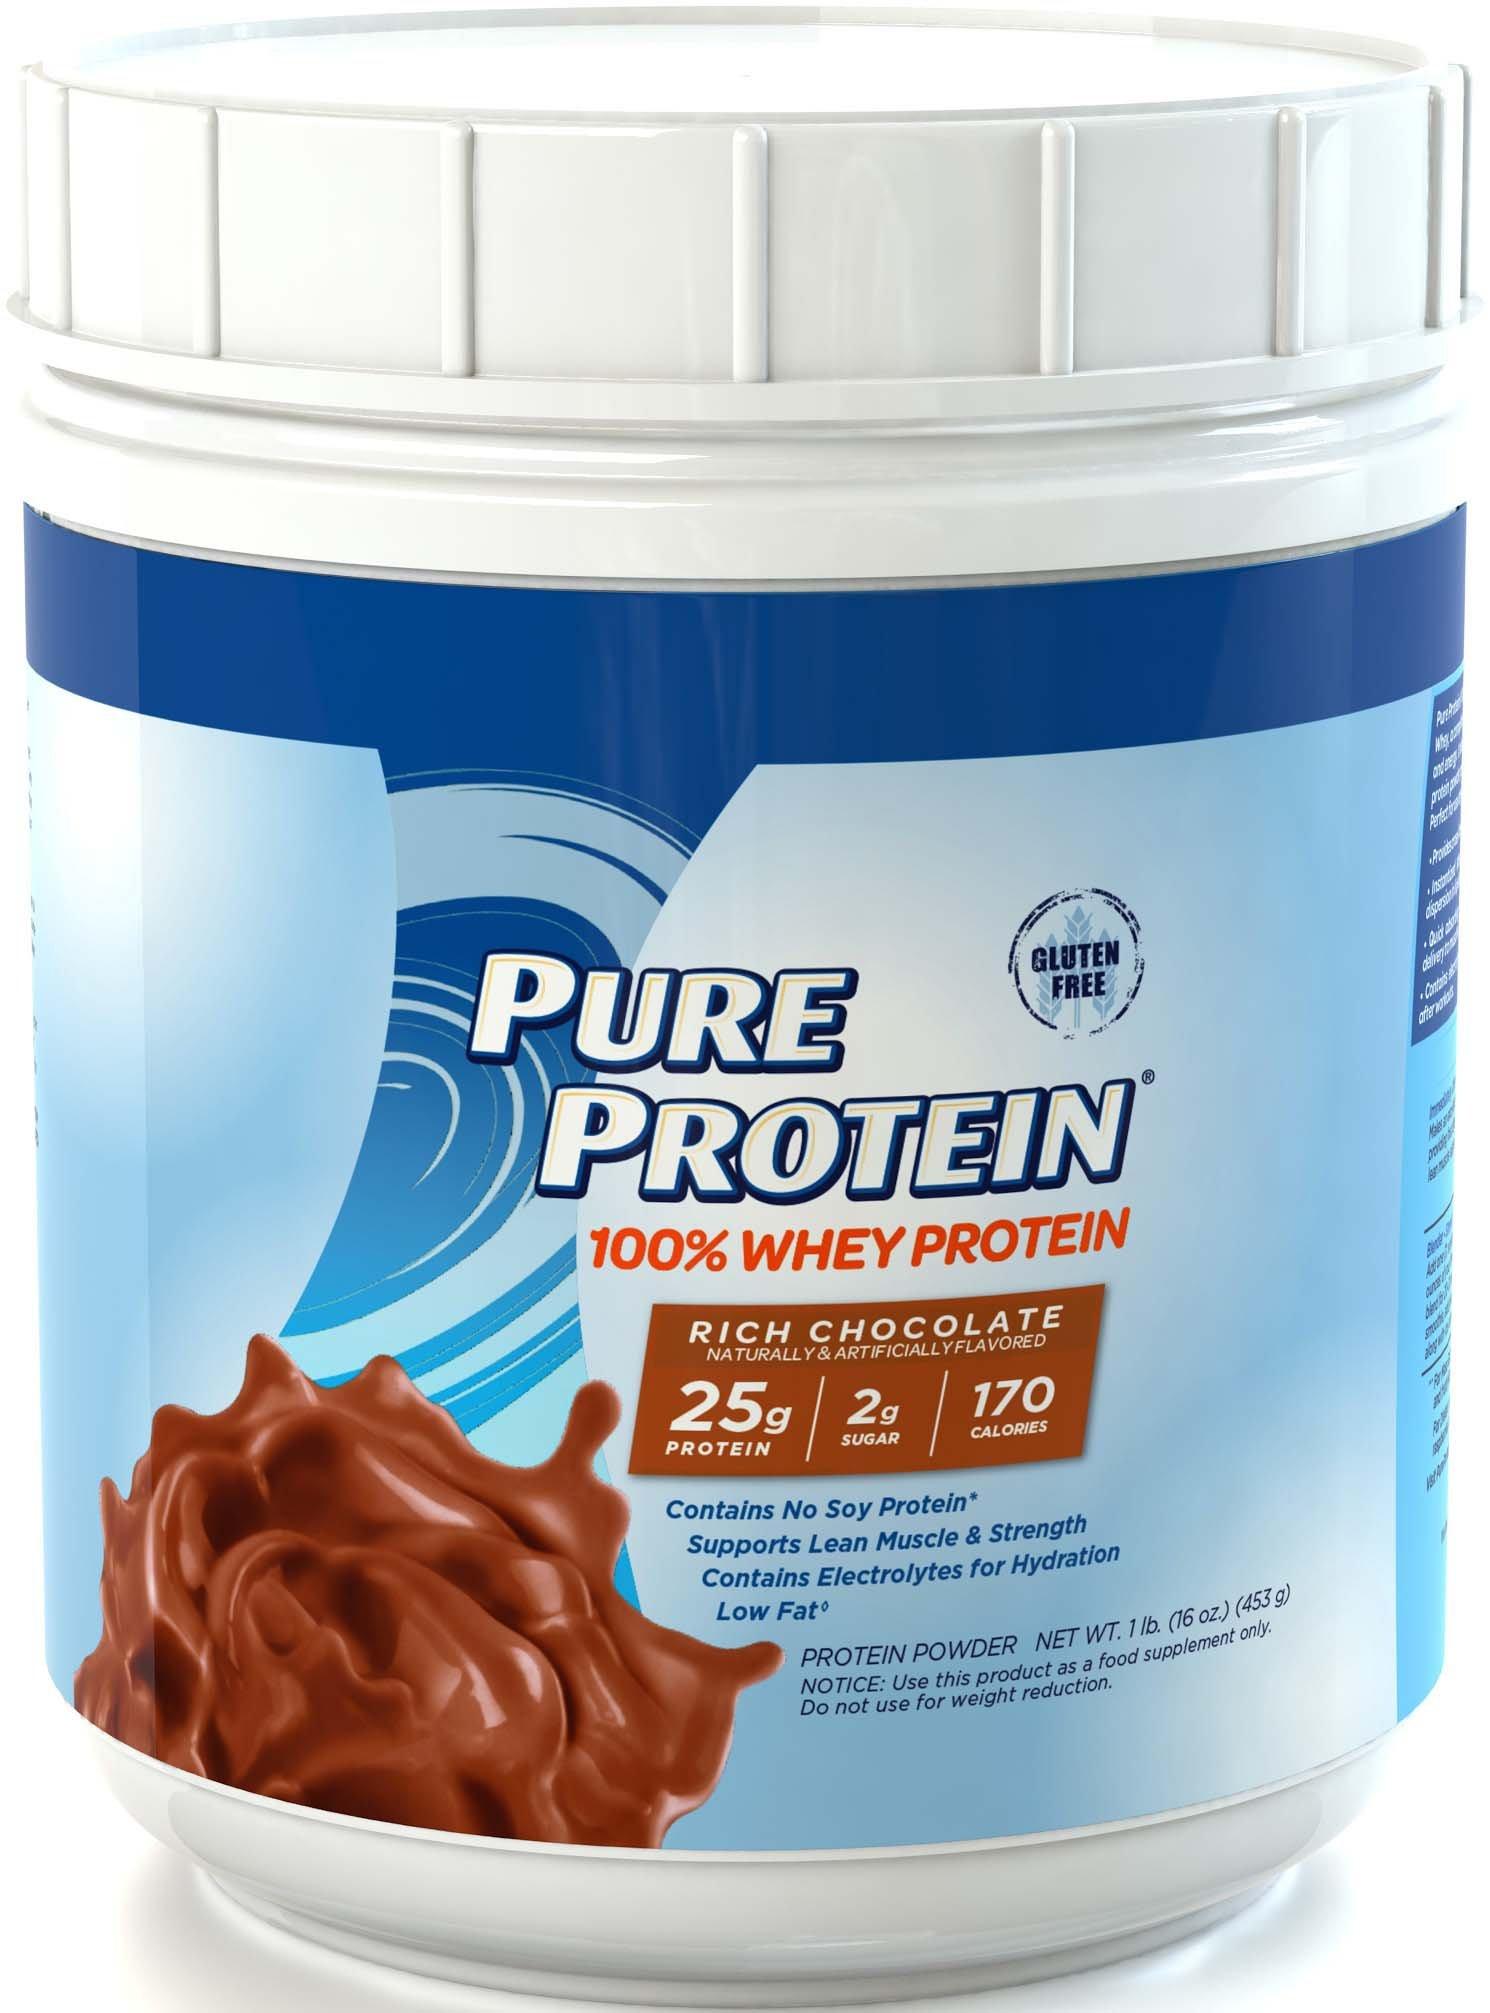 Whey protein powder how to make